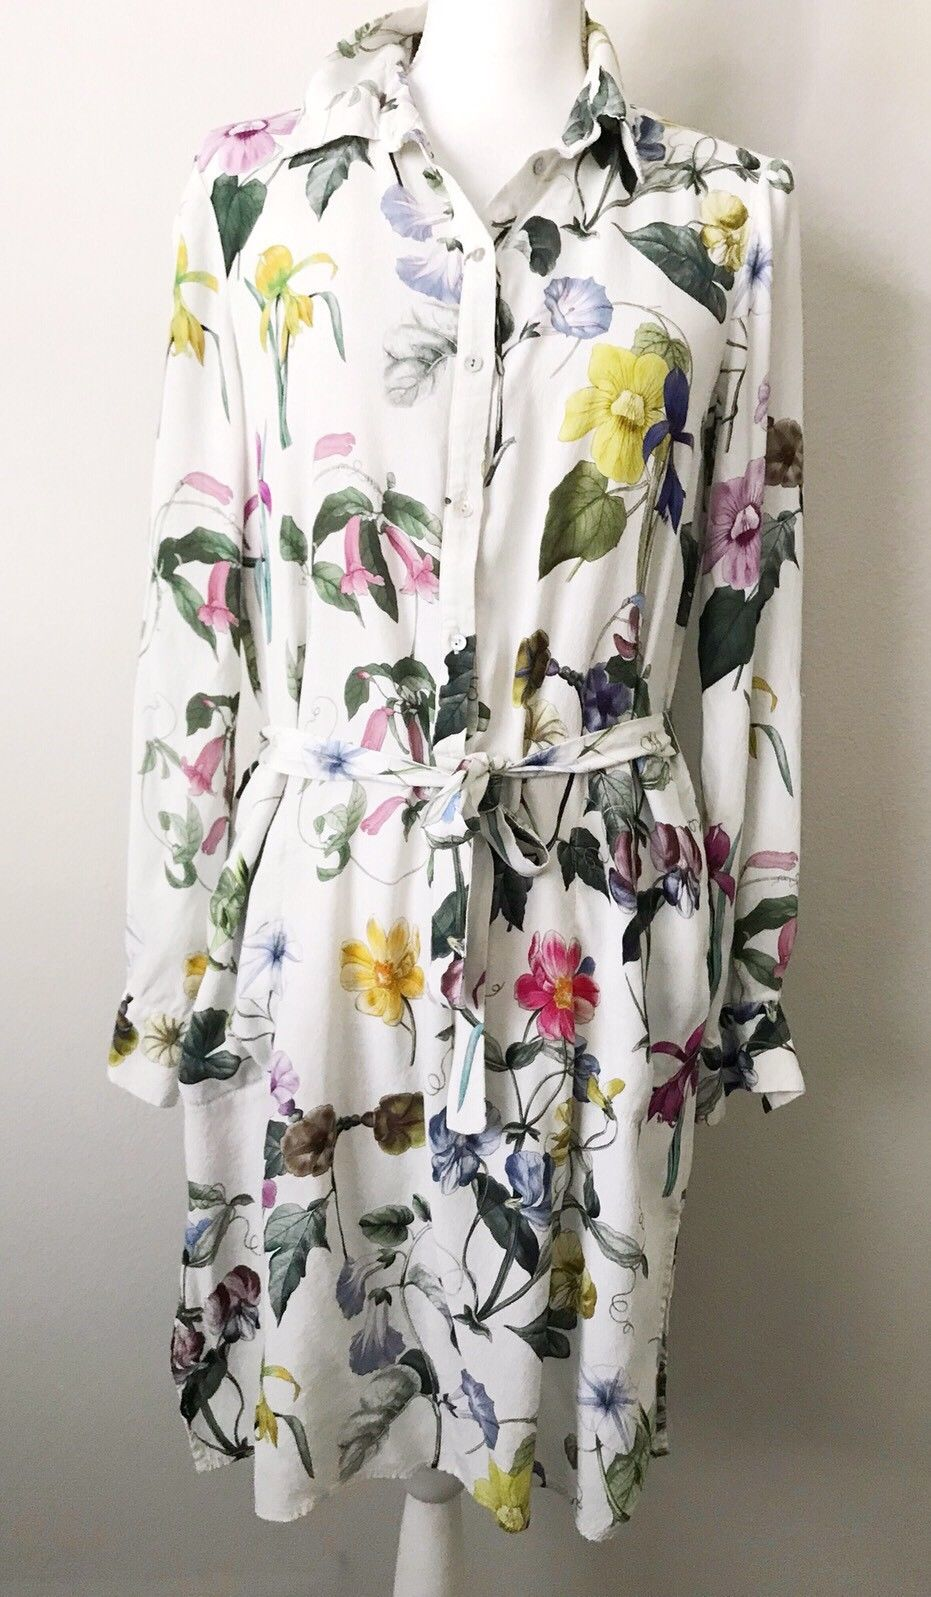 37bd7dc89 Zara Woman Floral Print Dress White Iris Leaves Womens Large Longsleeve  Viscose